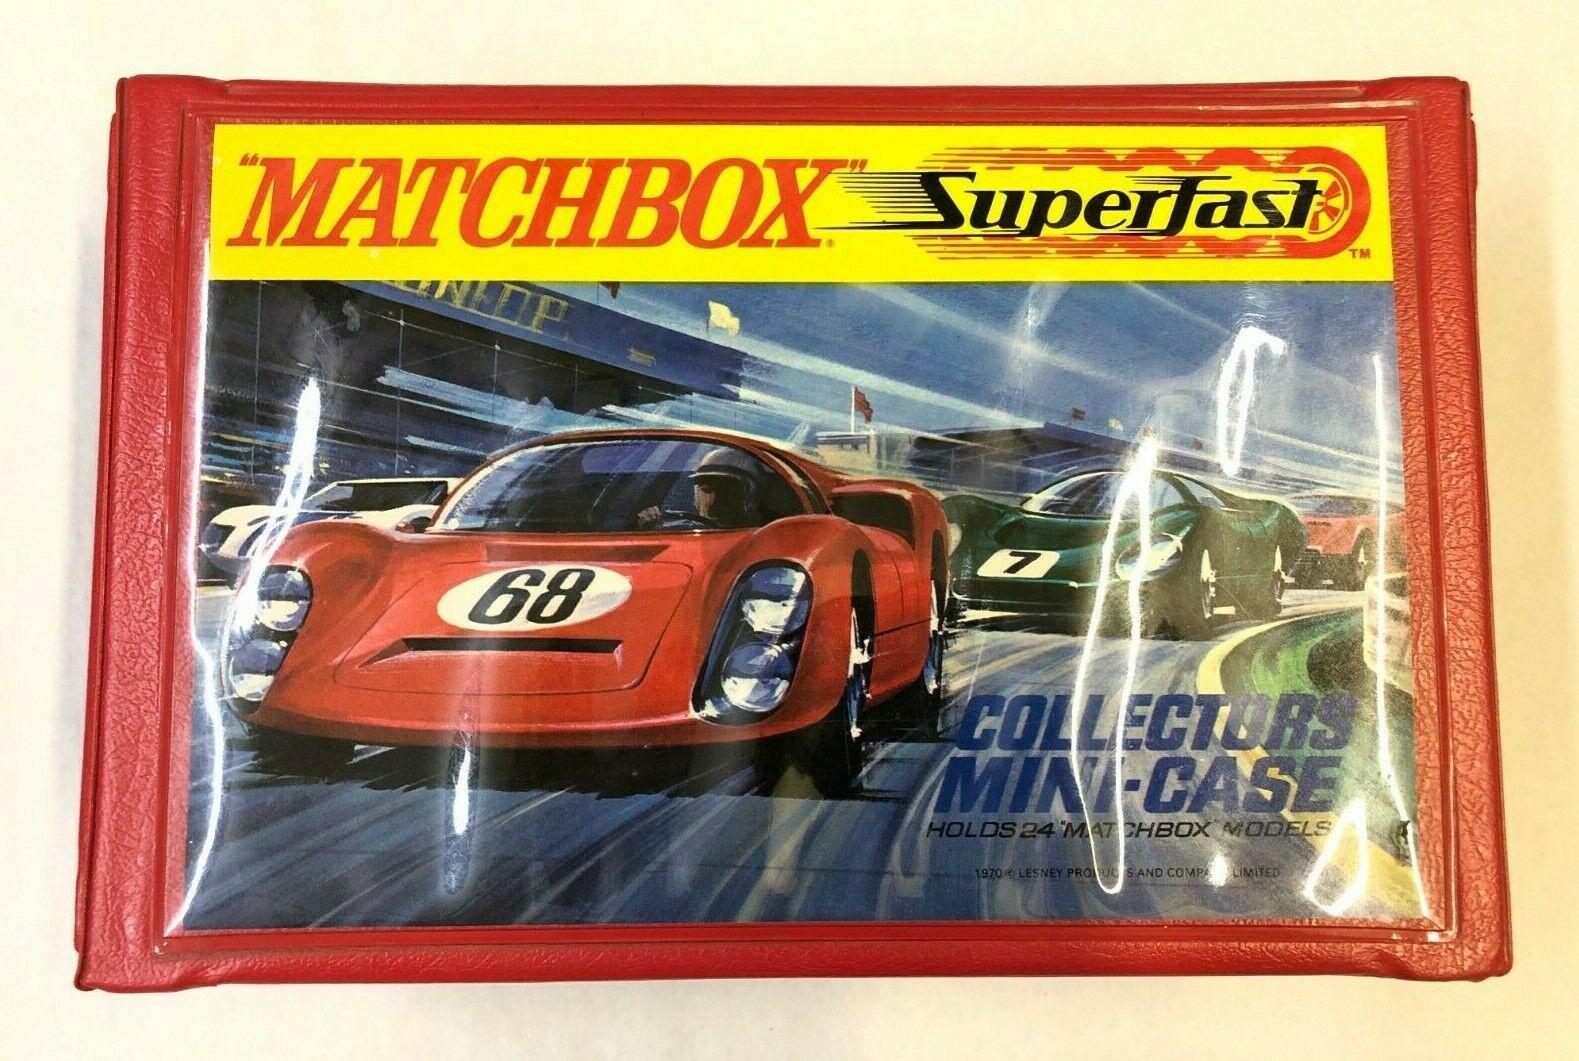 RARE VINTAGE MATCHBOX SUPERFAST COLLECTORS MINI-CASE W  12 ORIGINAL CARS VW BUG